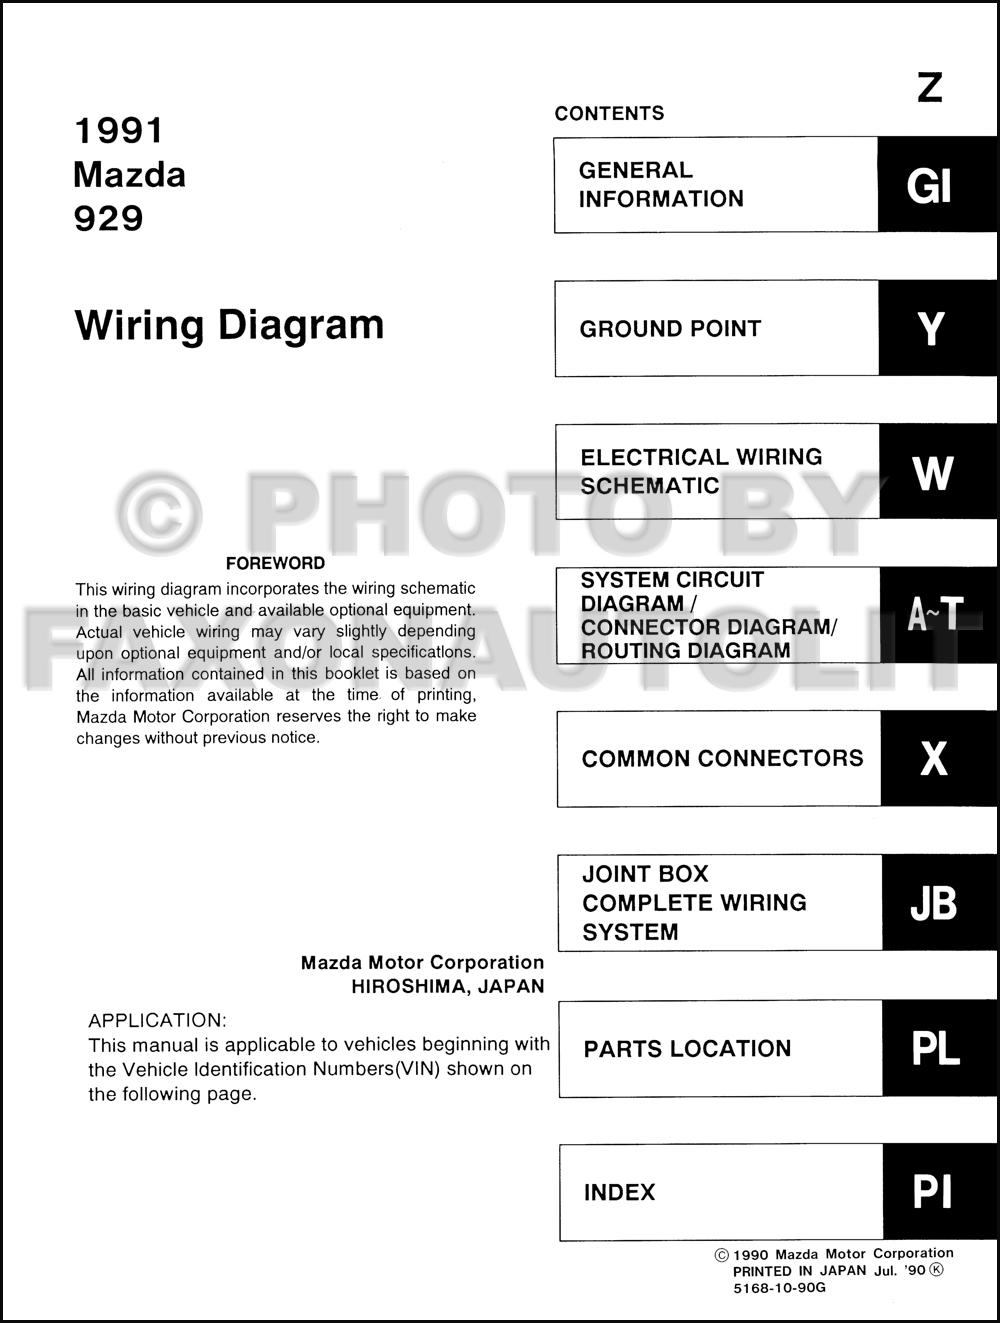 1991 mazda 929 wiring diagram manual original mazda 929 wiring diagram #1